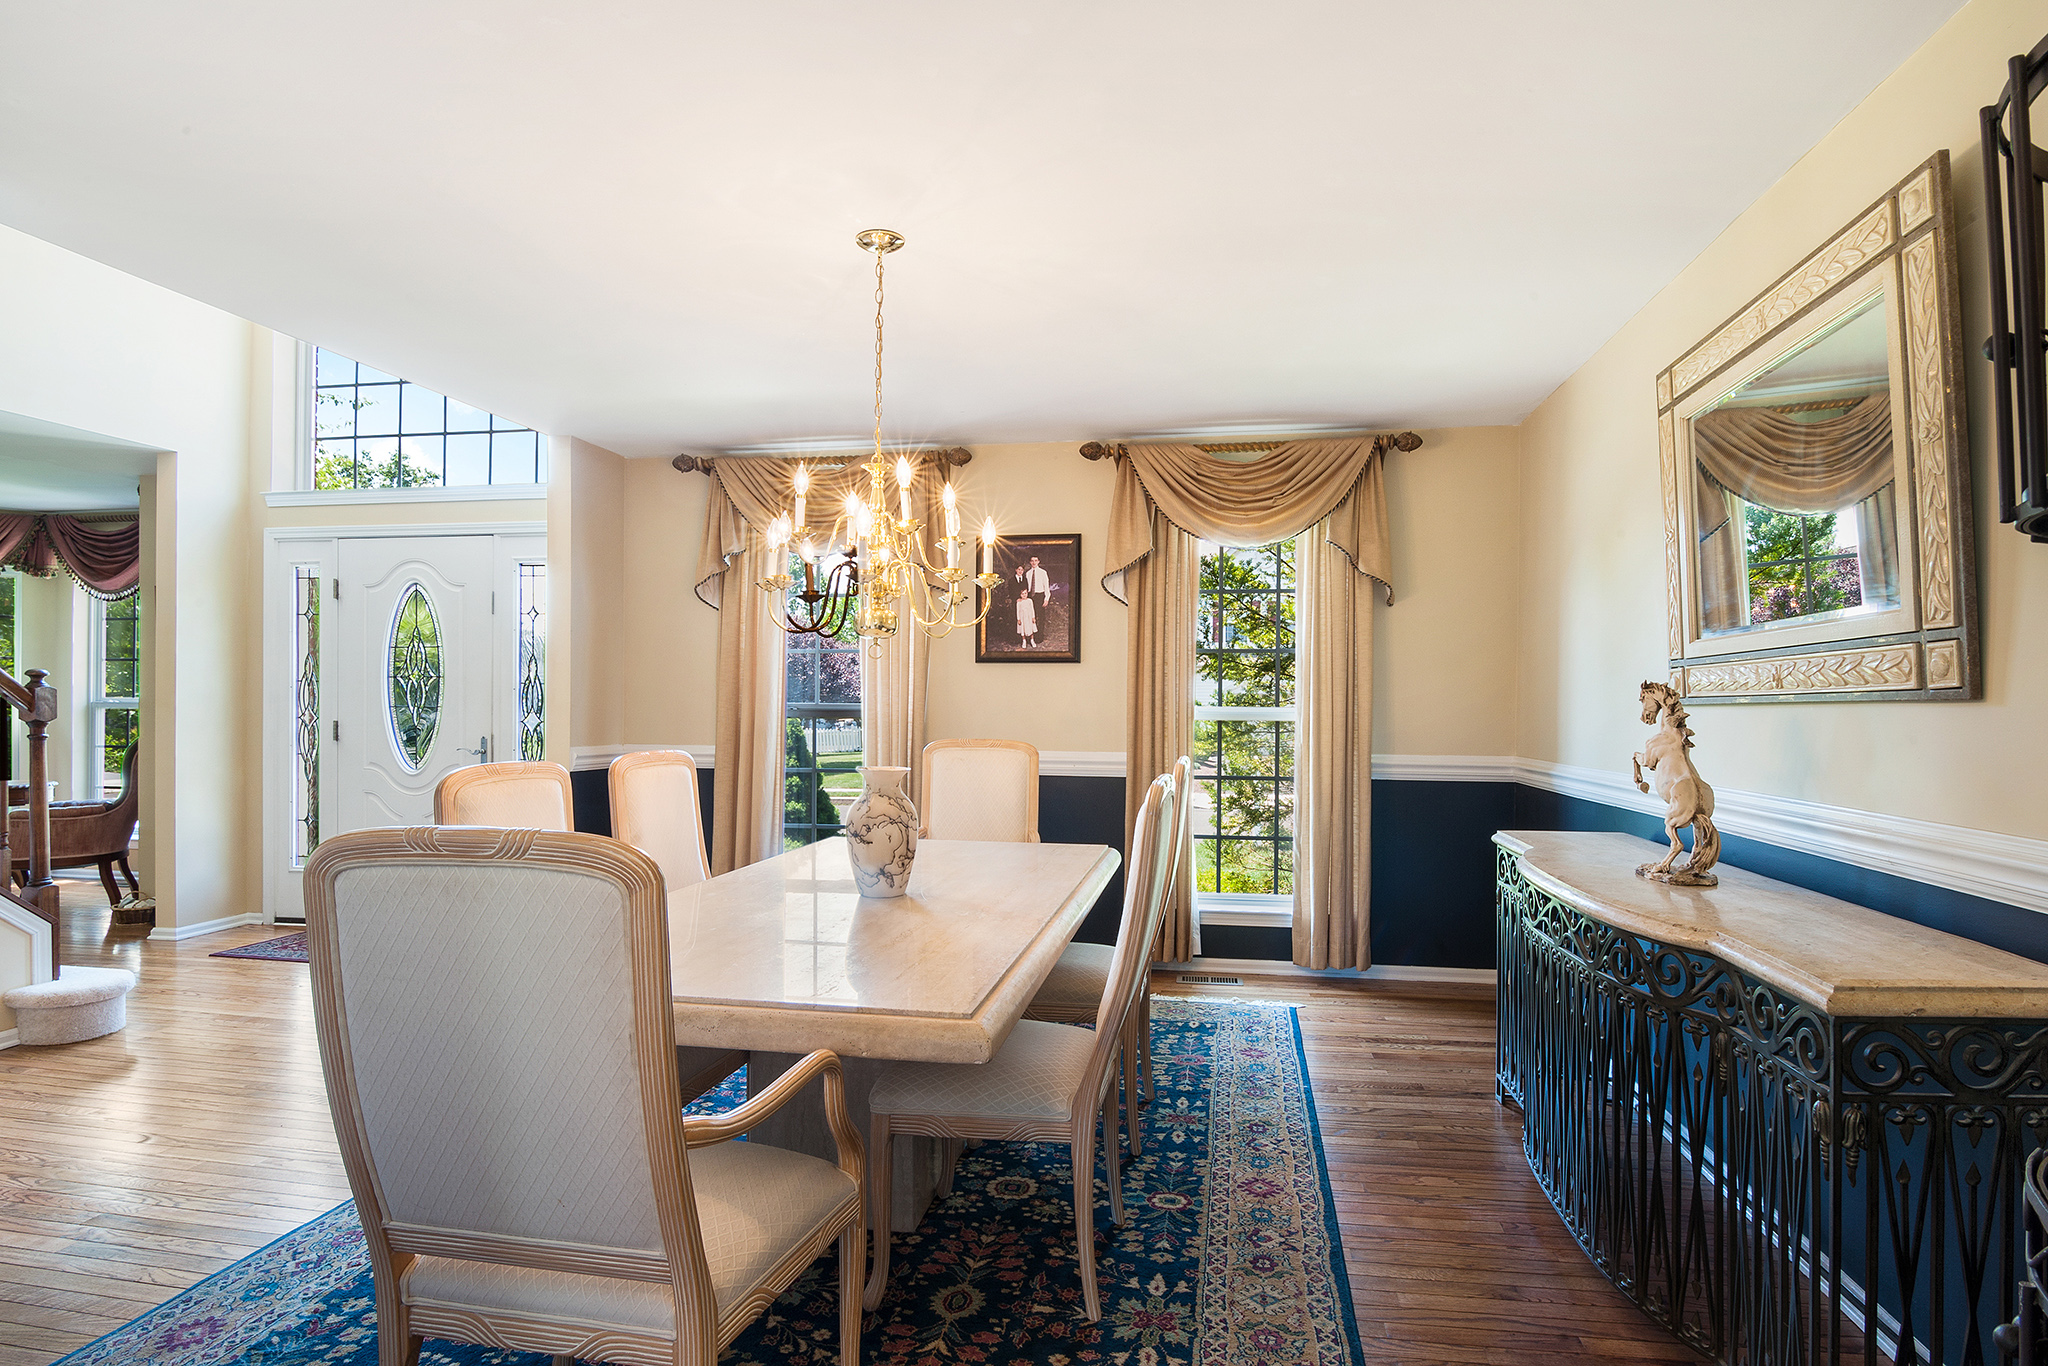 www.PeddlersViewForSale.com | Peddlers View Homes for Sale | #LahaskaRealtors